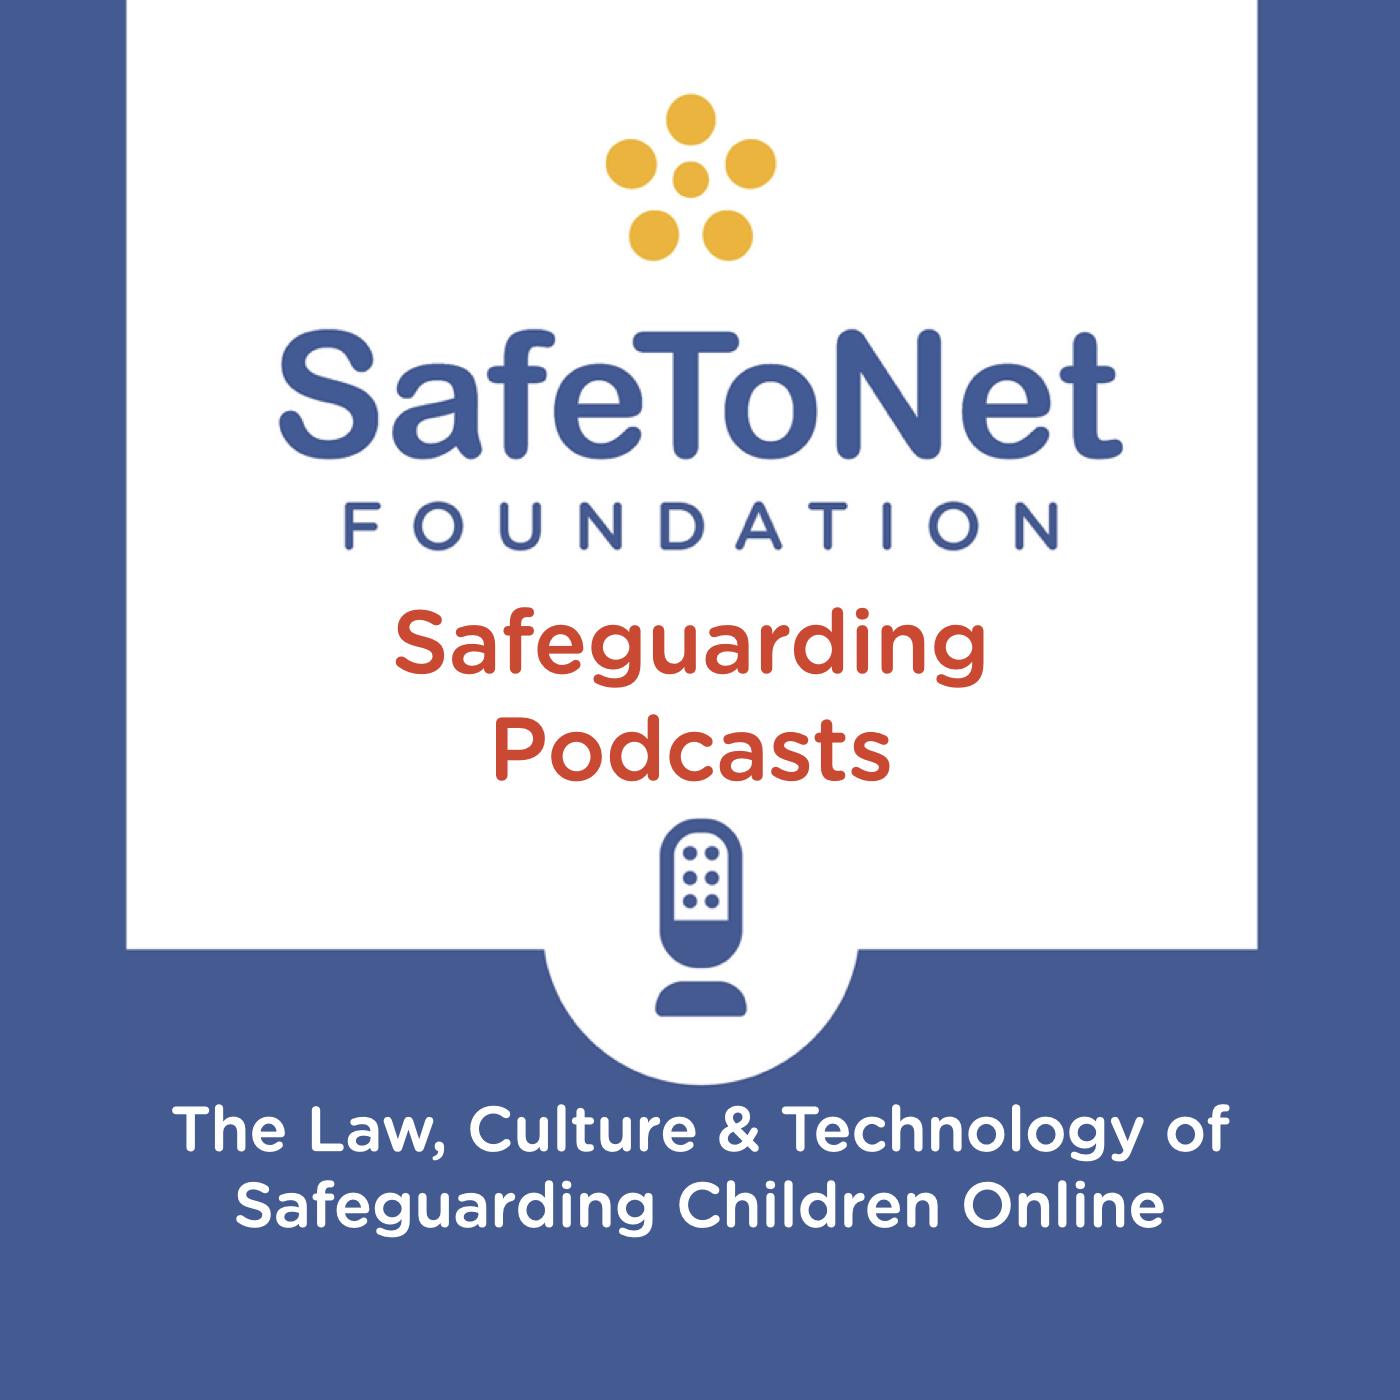 The SafeToNet Foundation's Safeguarding podcasts show art